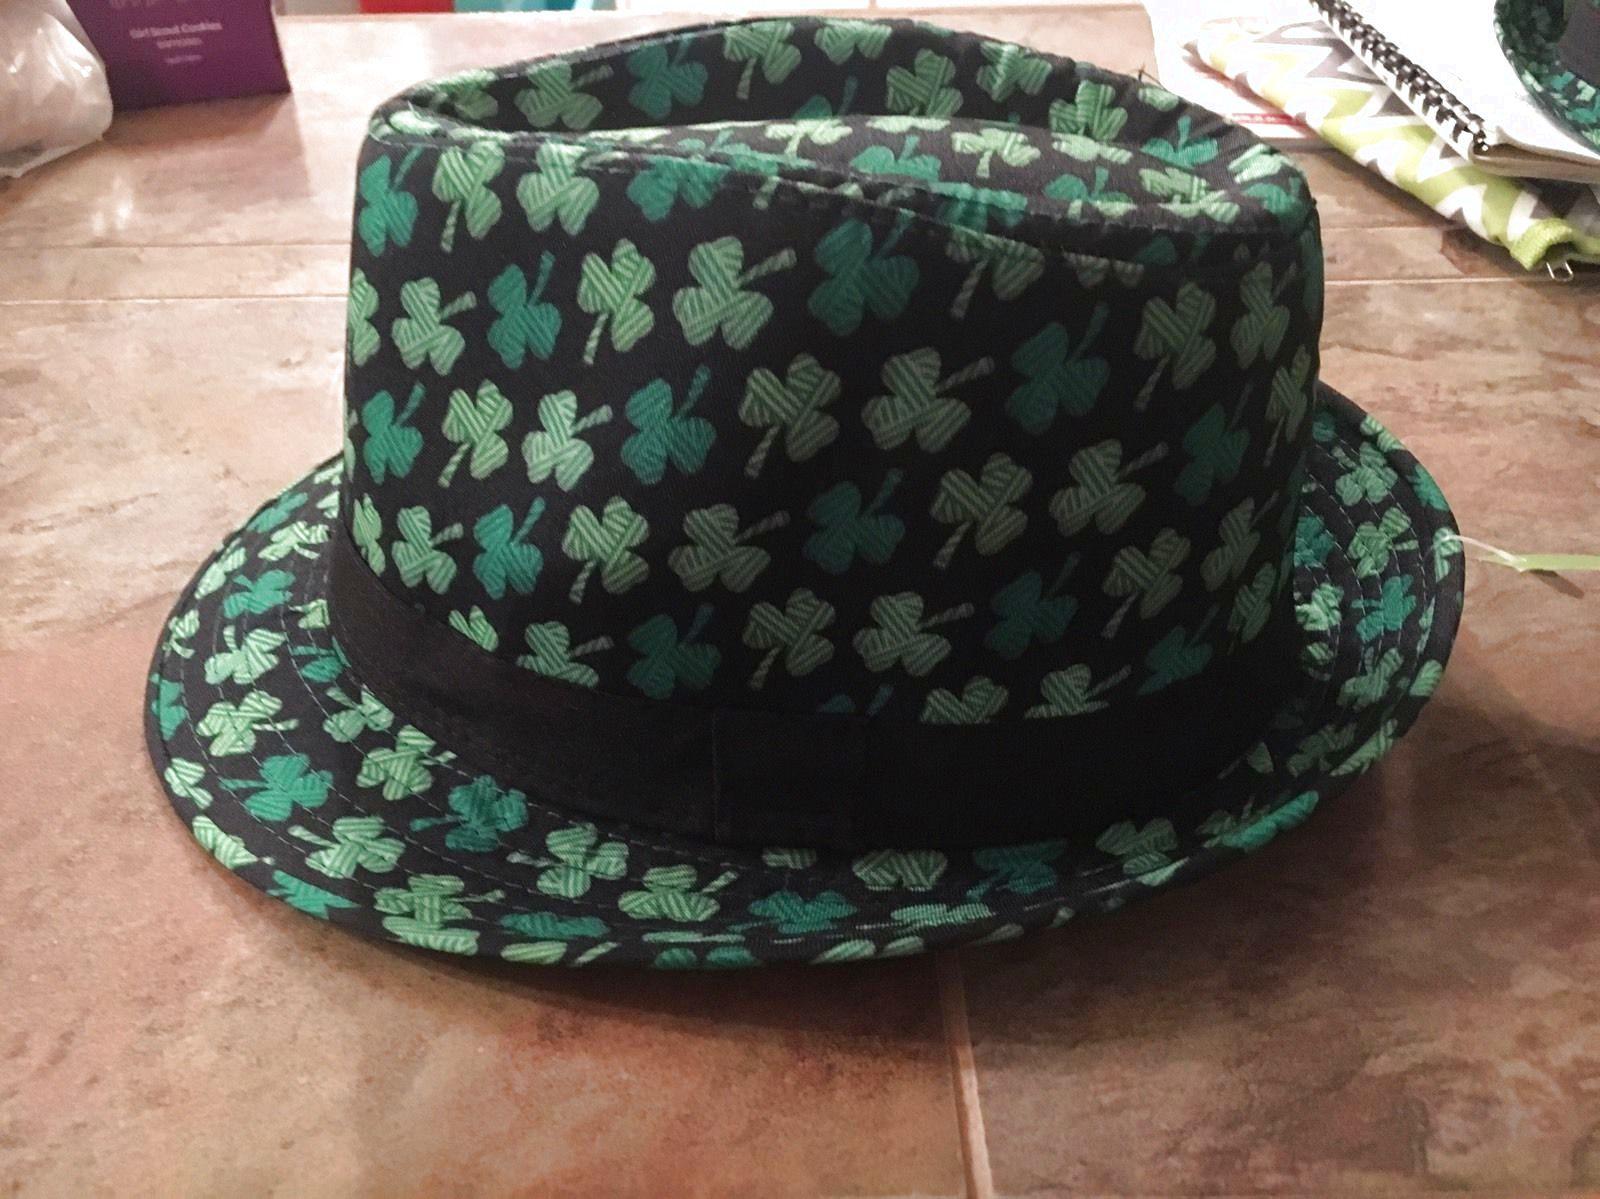 960e6e72b18b5 ST PATRICKS DAY FEDORA HAT GREEN IRISH COSTUME ACCESSORY SHAMROCK CAP  PARADE  14.99